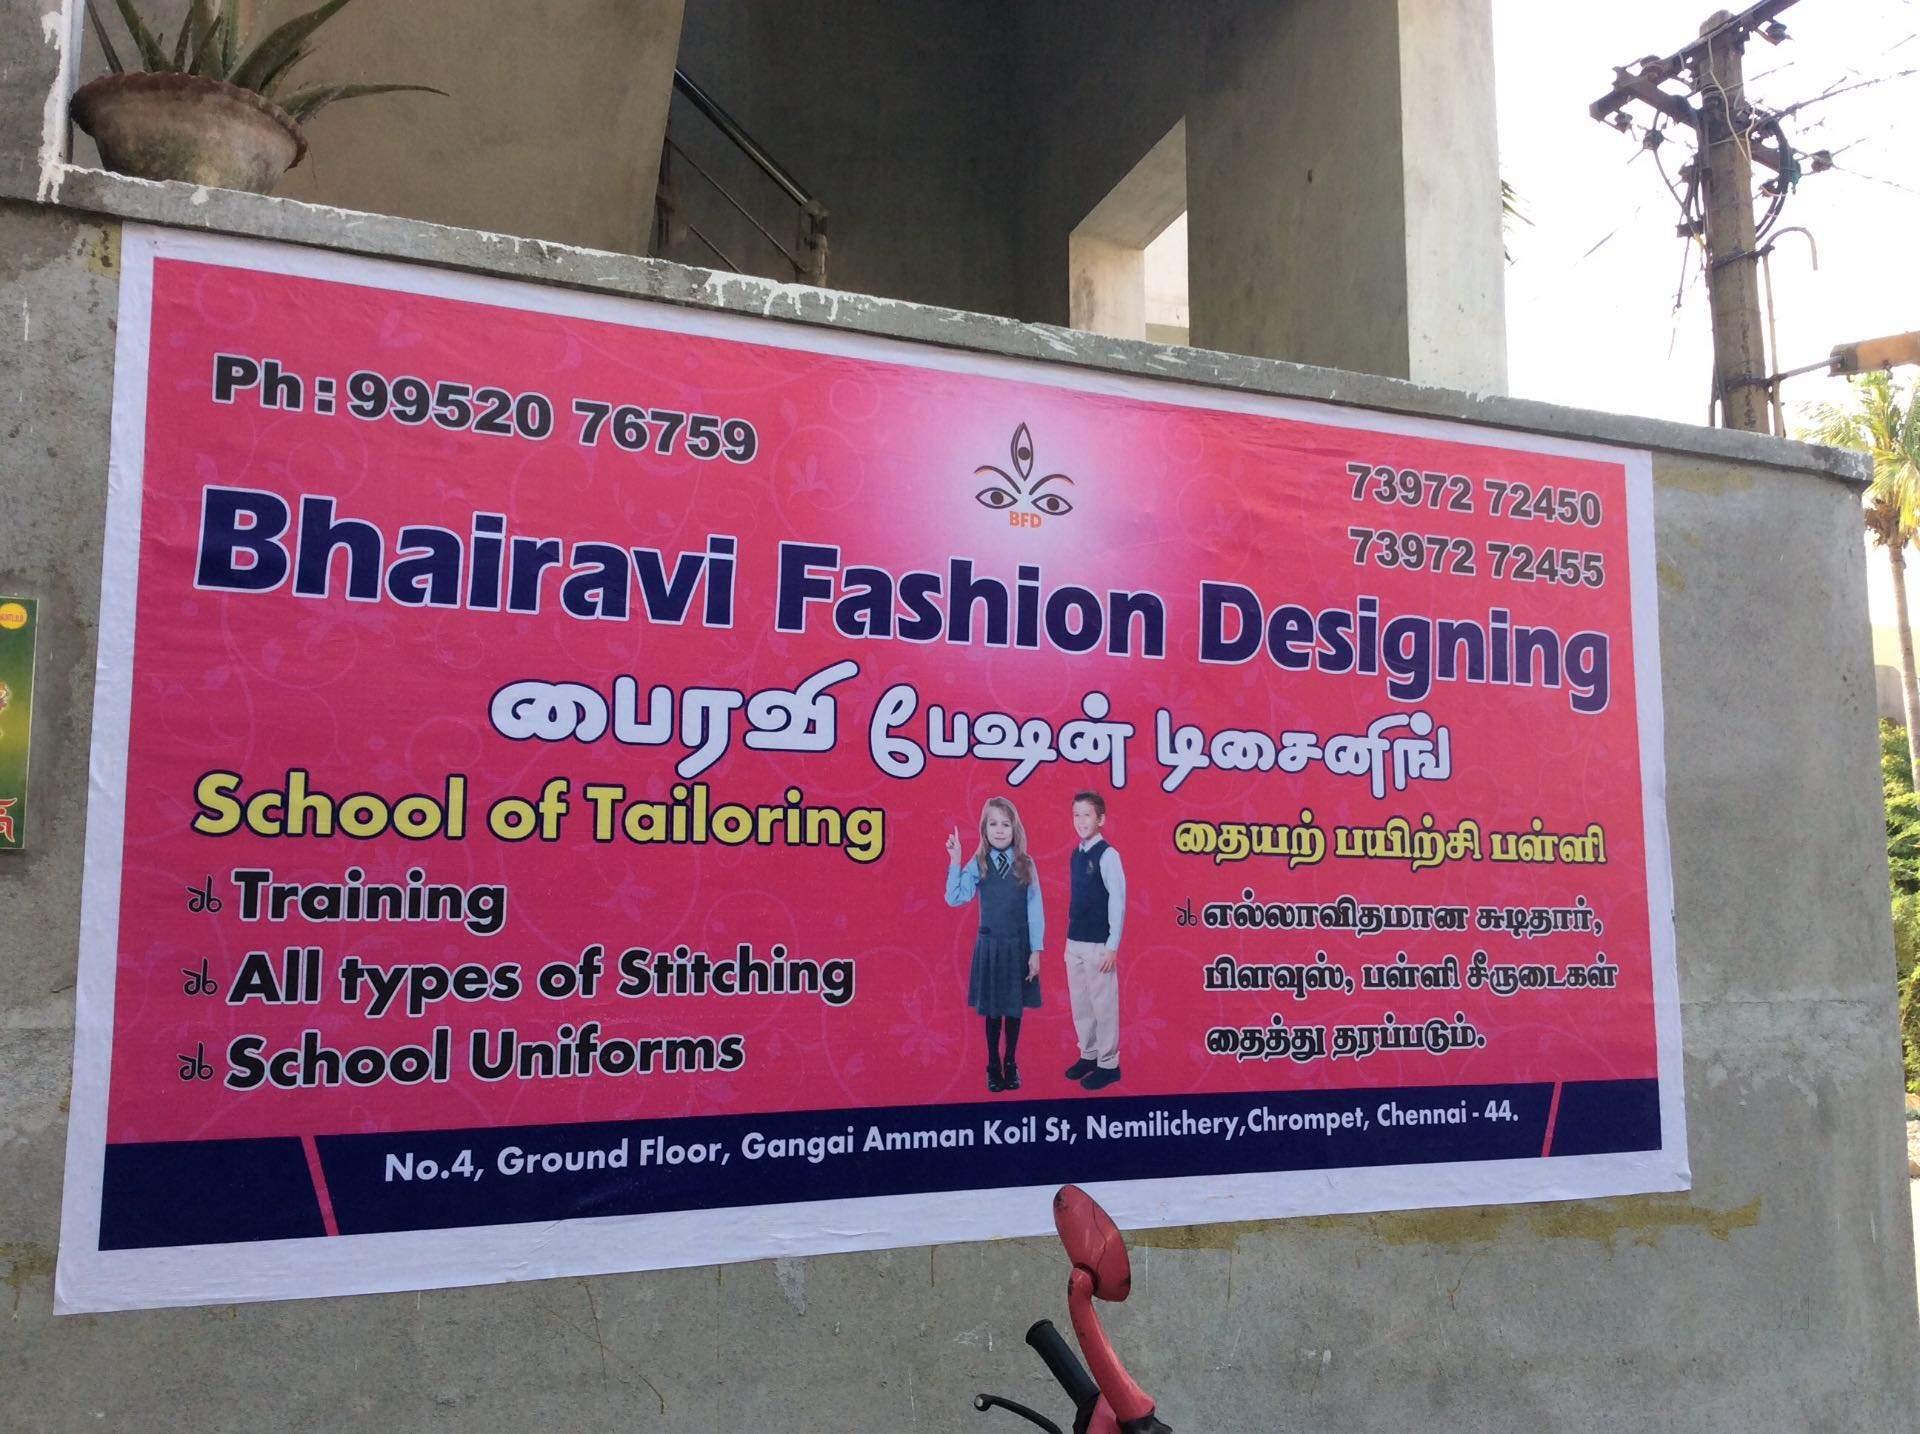 Bhairavi Fashion Designing Nemilichery Chrompet Tailoring Classes In Chennai Justdial